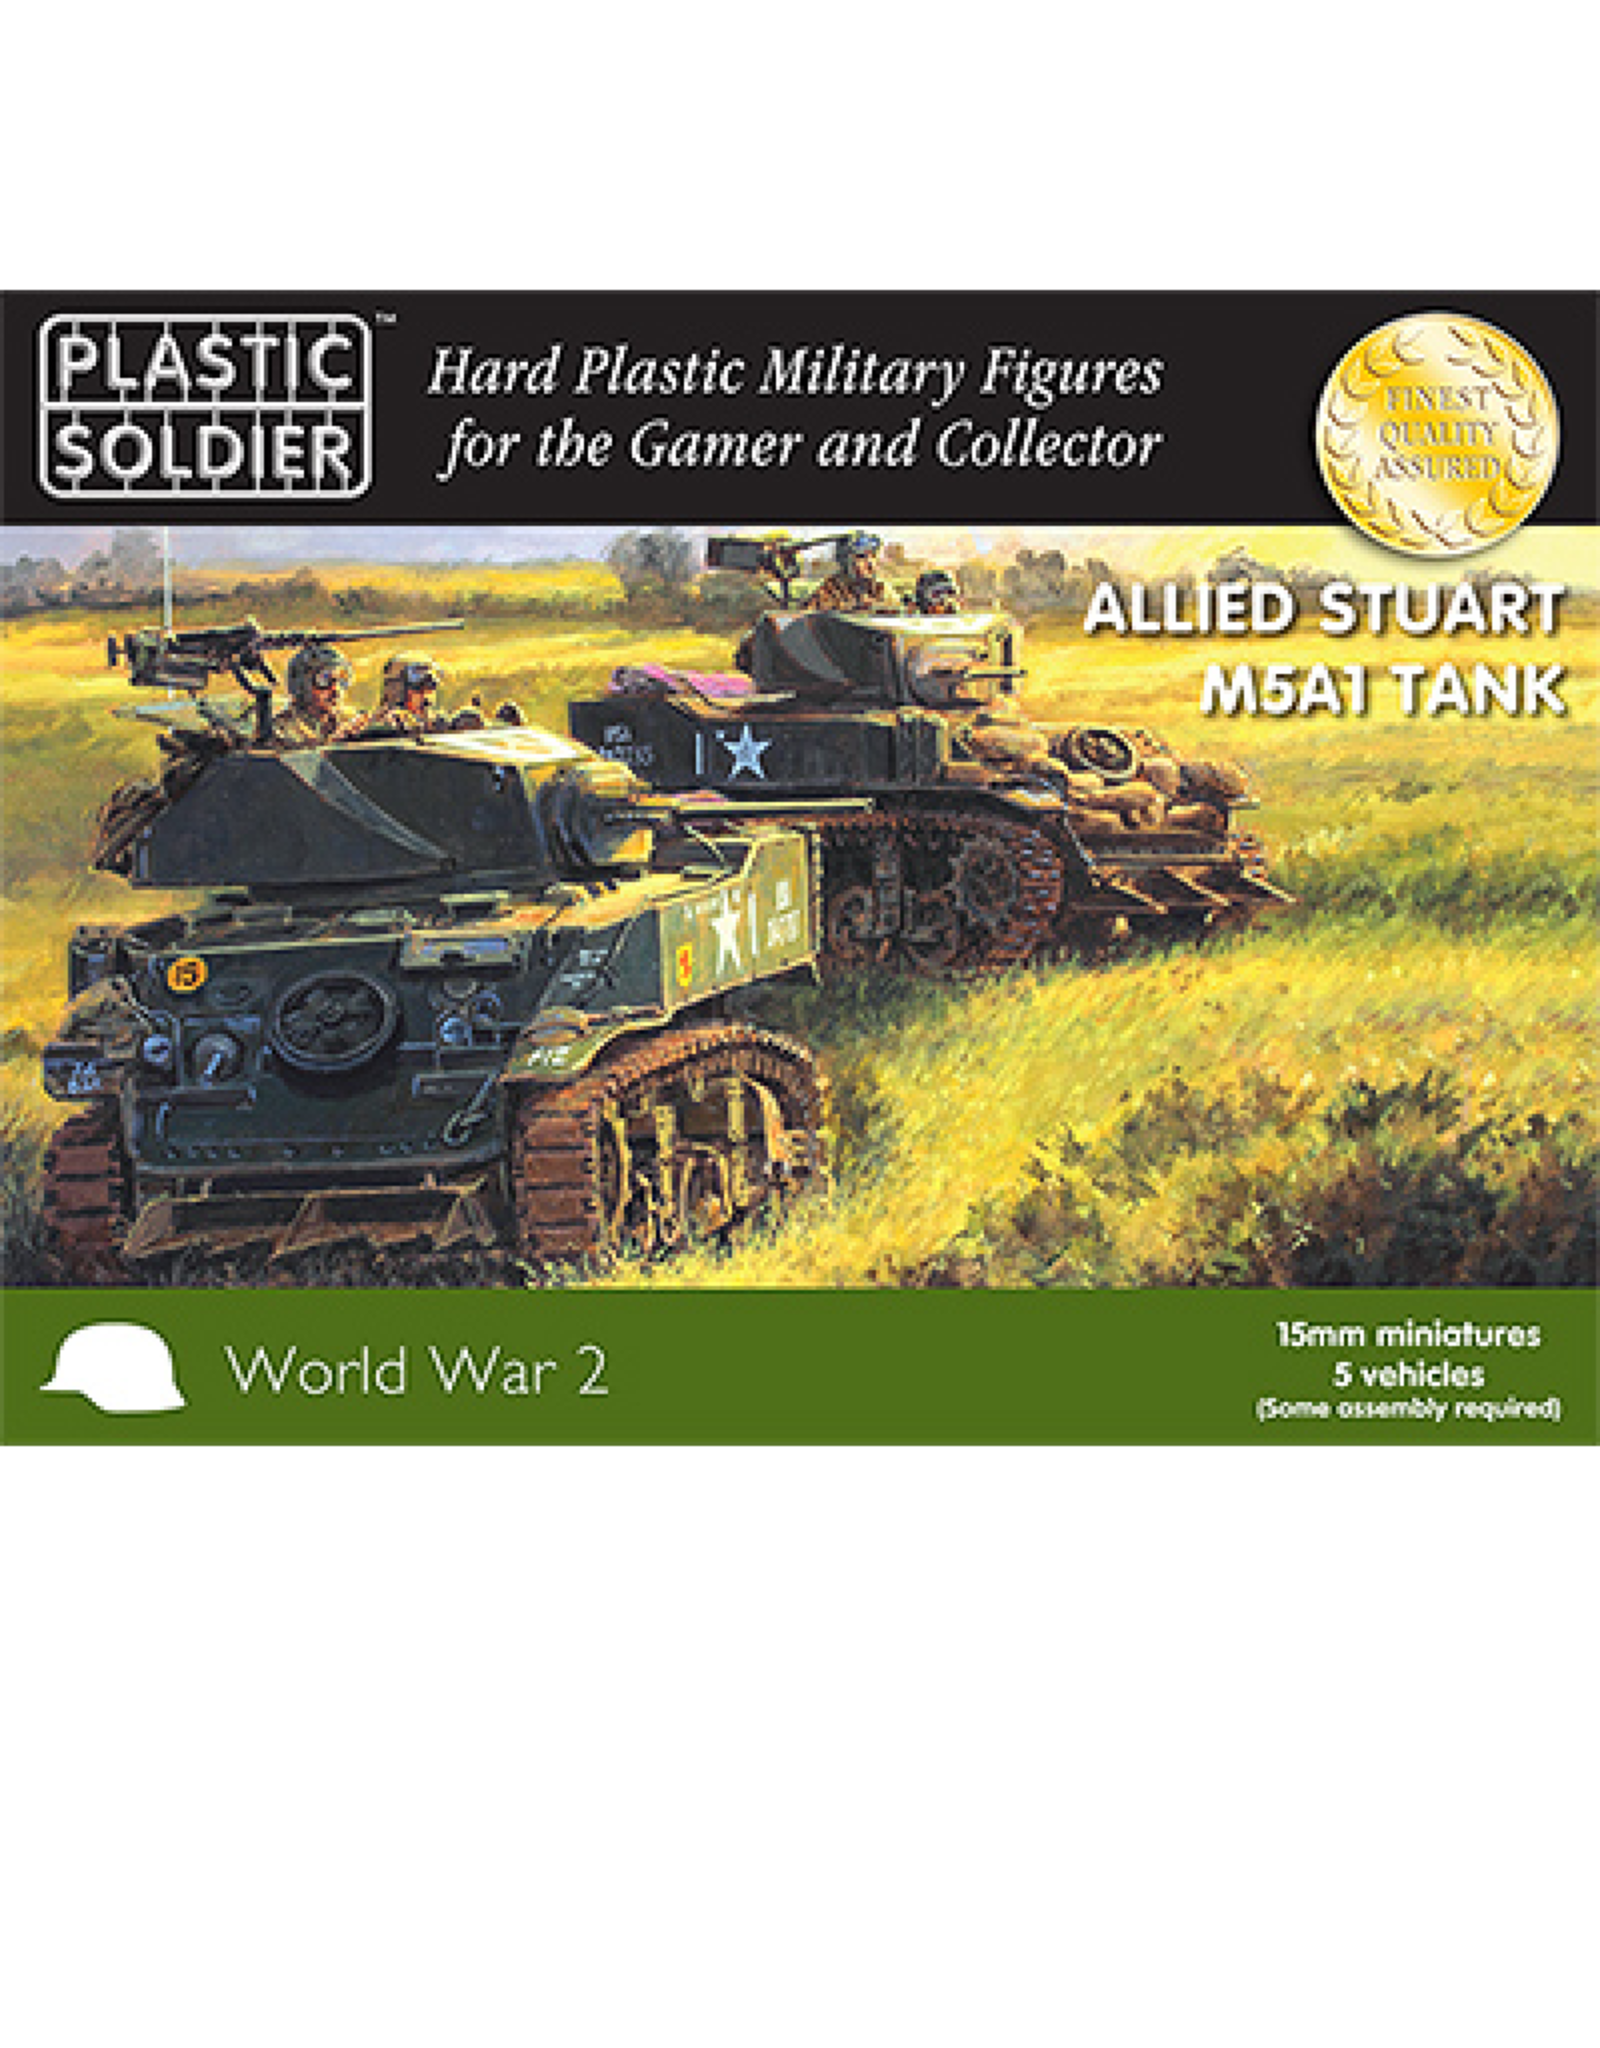 Plastic Soldier Company Allied M5A1 Stuart Tank